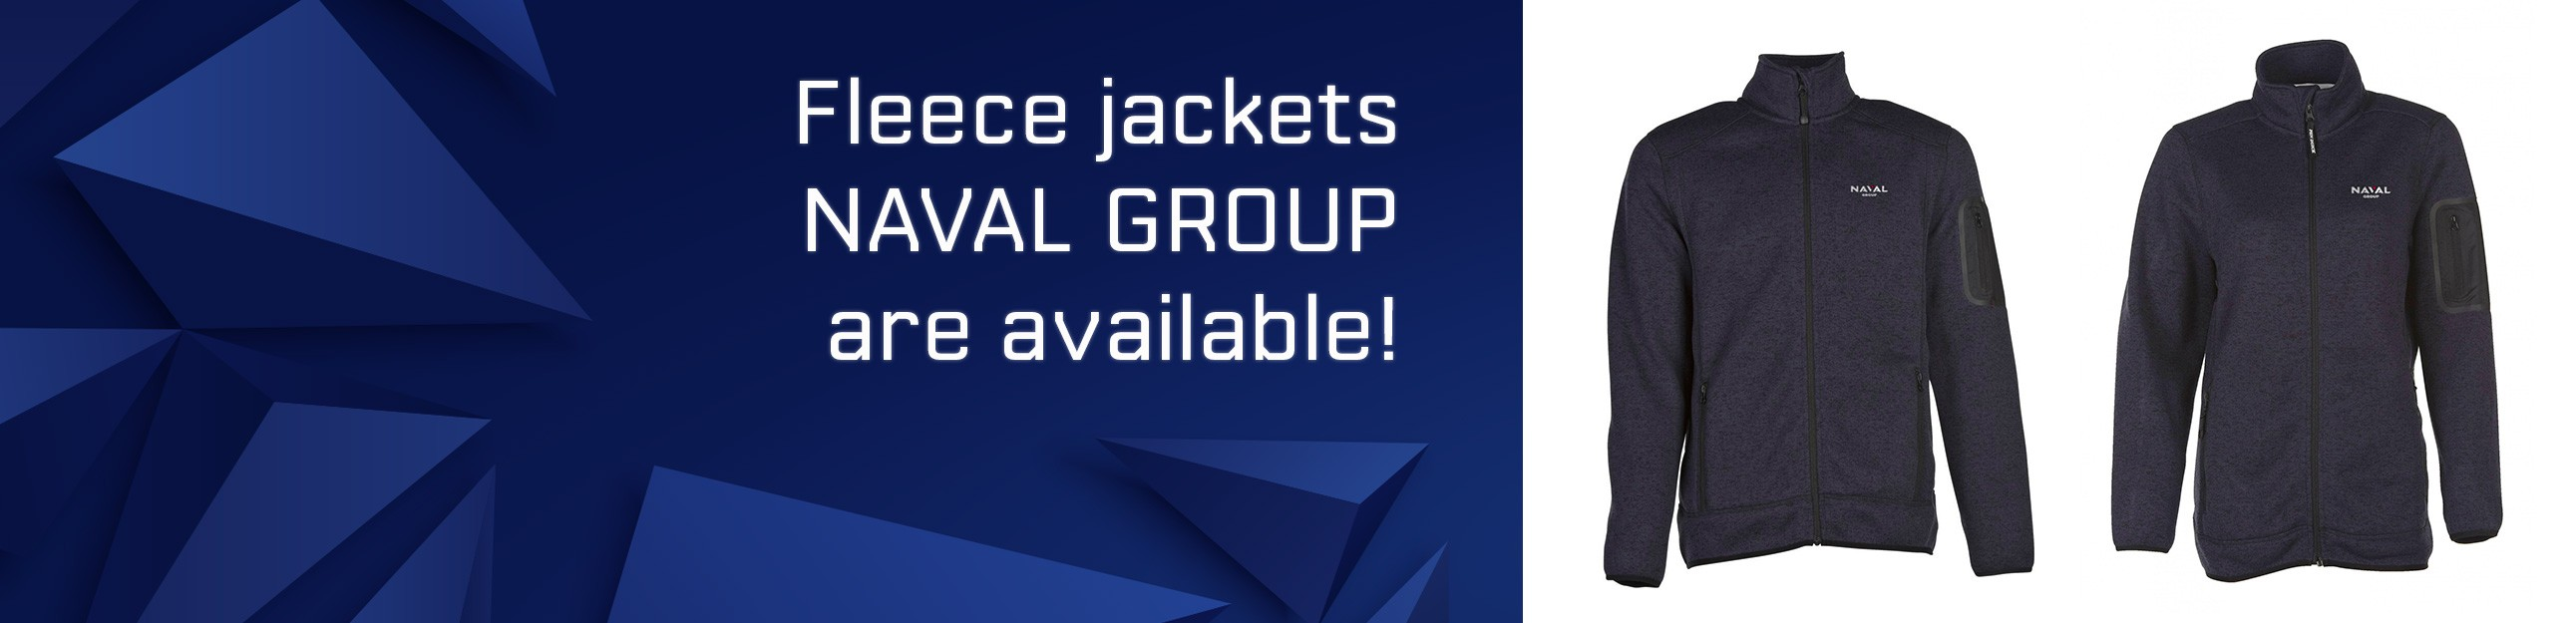 Fleece jackets 2020 Naval Group